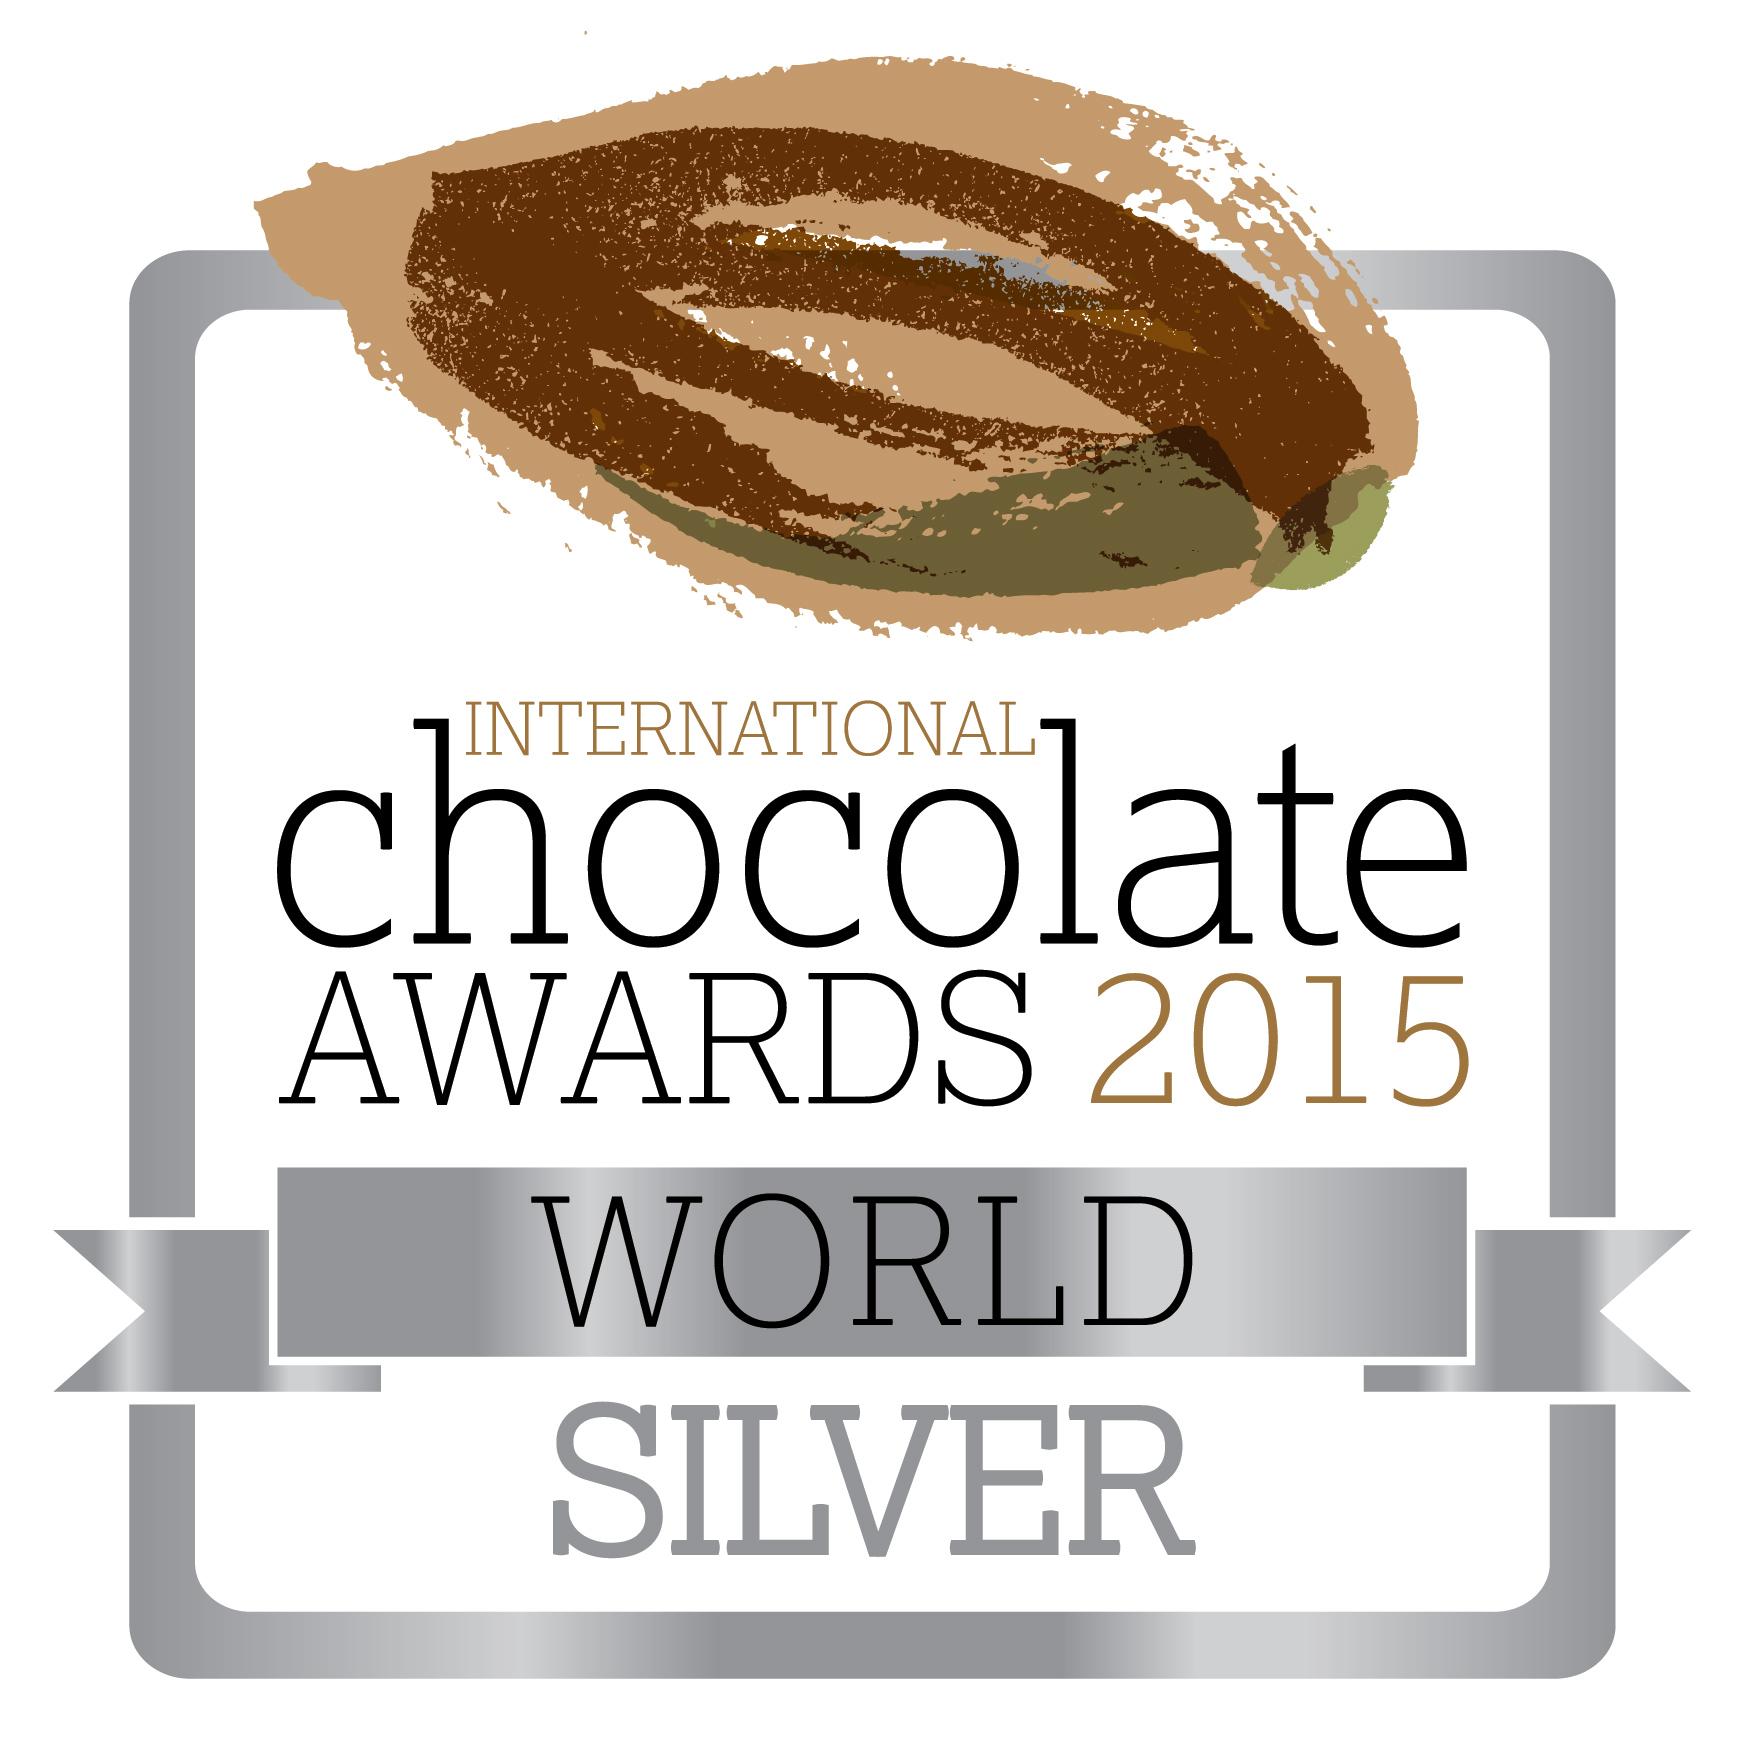 International Chocolate Awards 2015 - Silver - World RGB - web.jpg